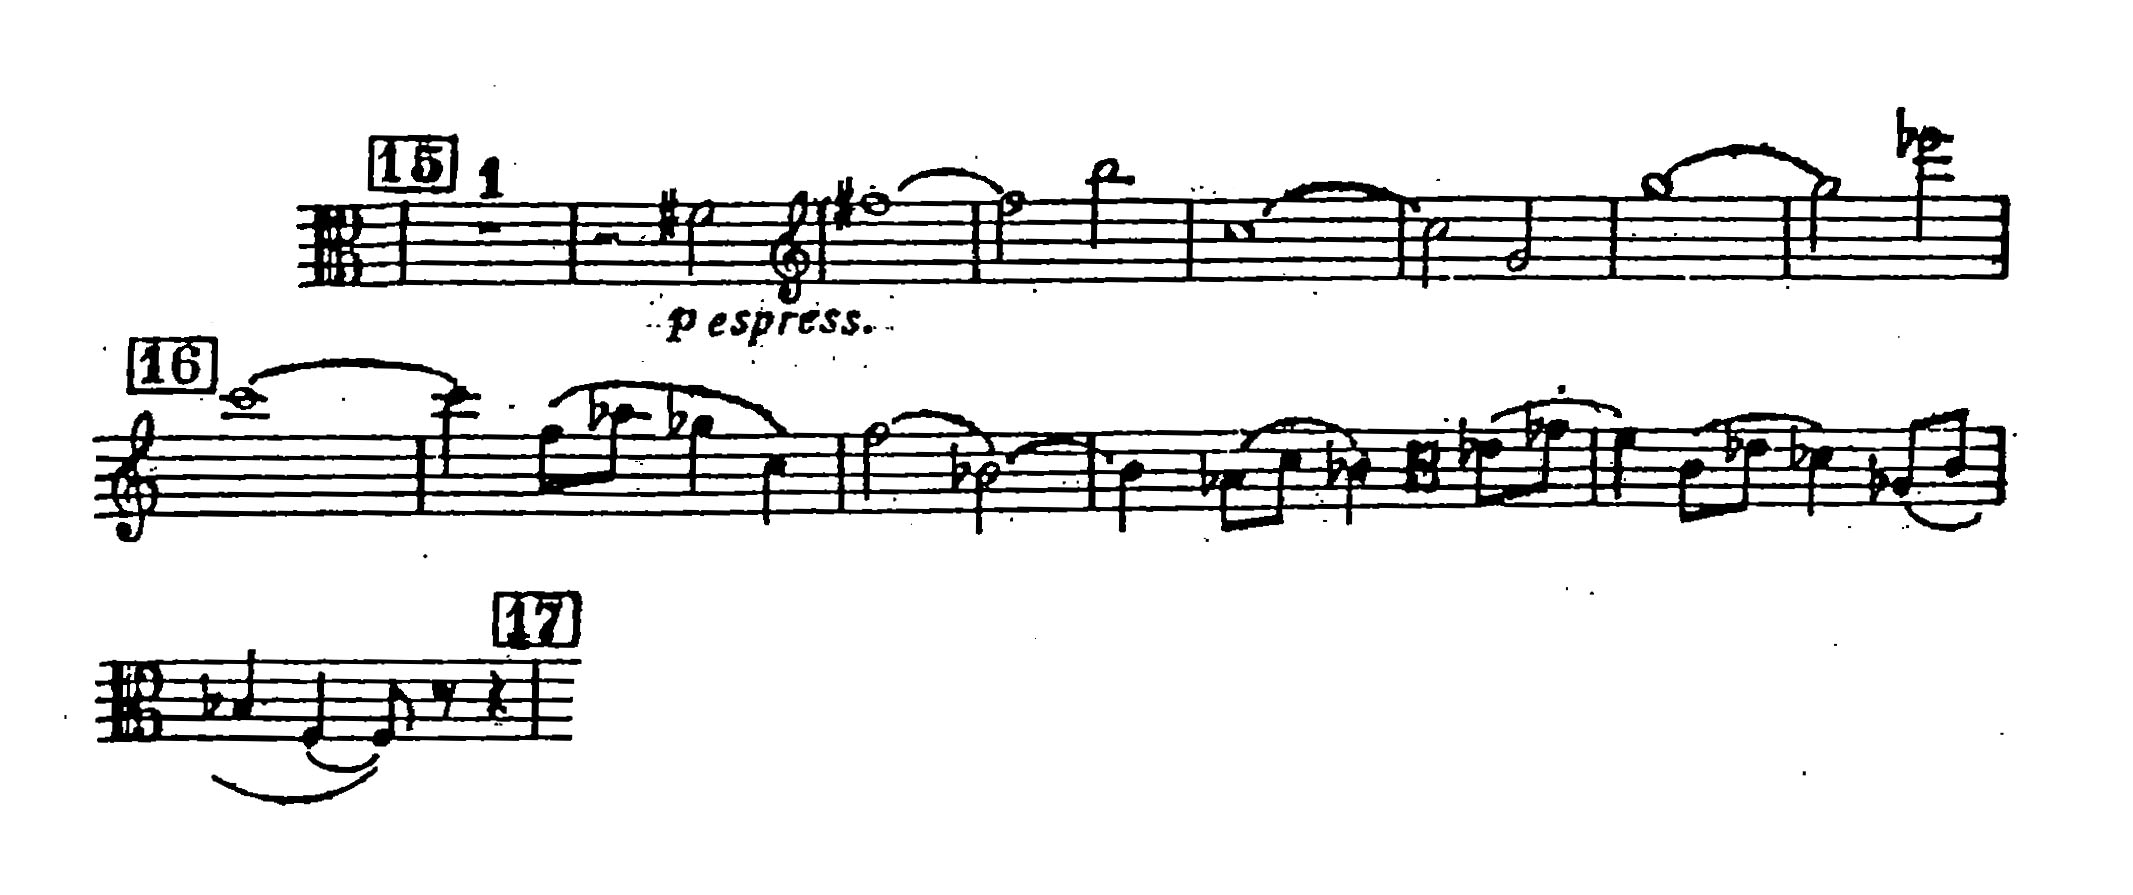 Viola Orchestral Excerpt Shostakovich Symphony 5